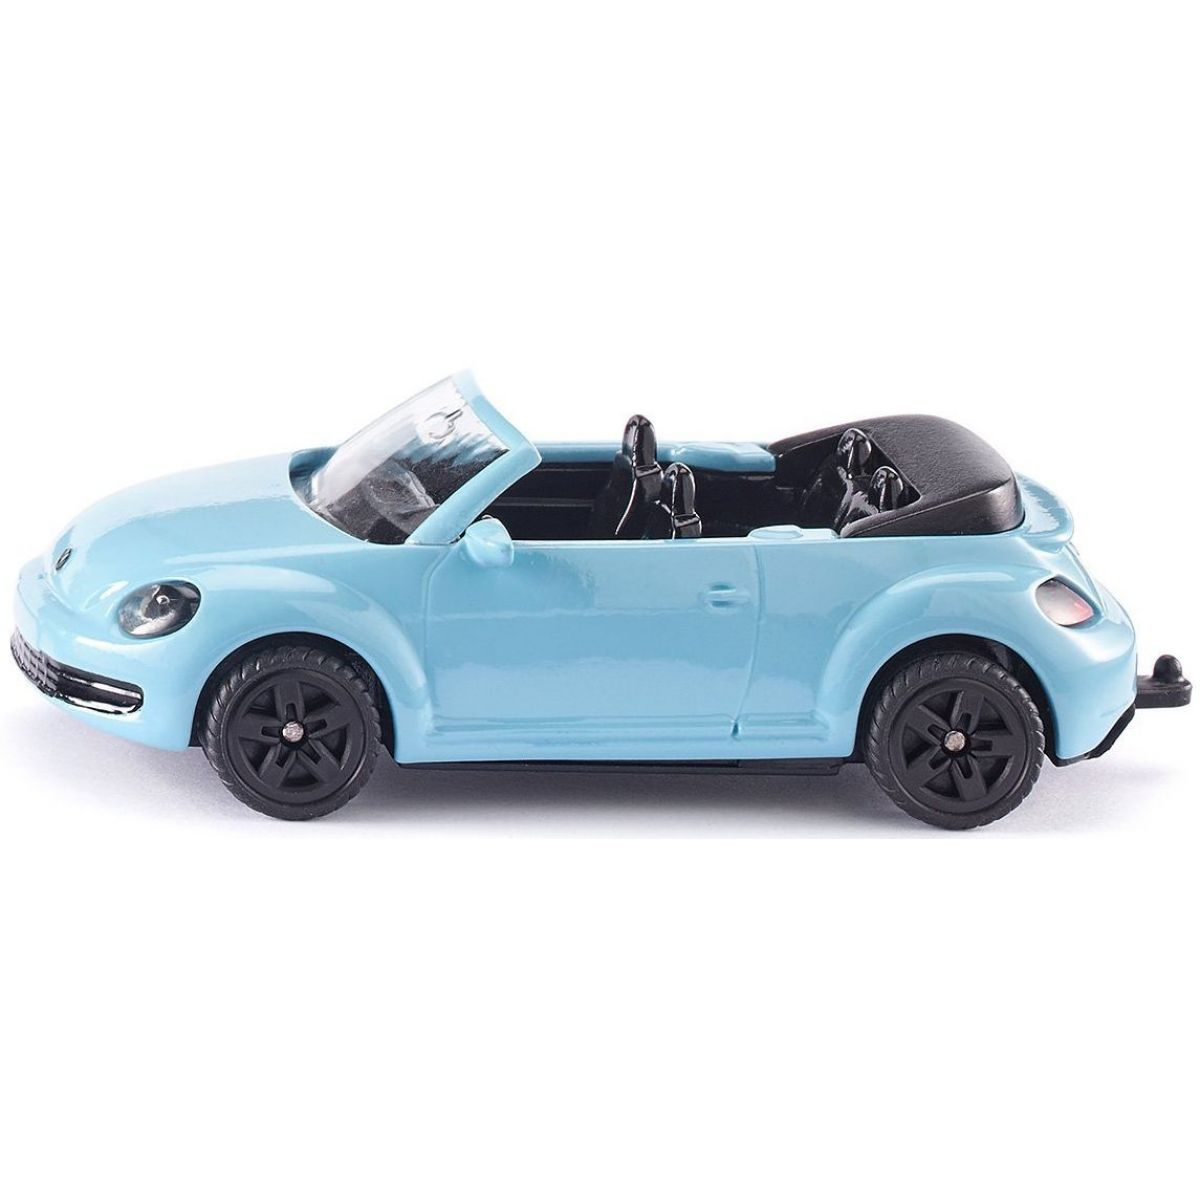 Siku Blister VW The Beetle Cabrio